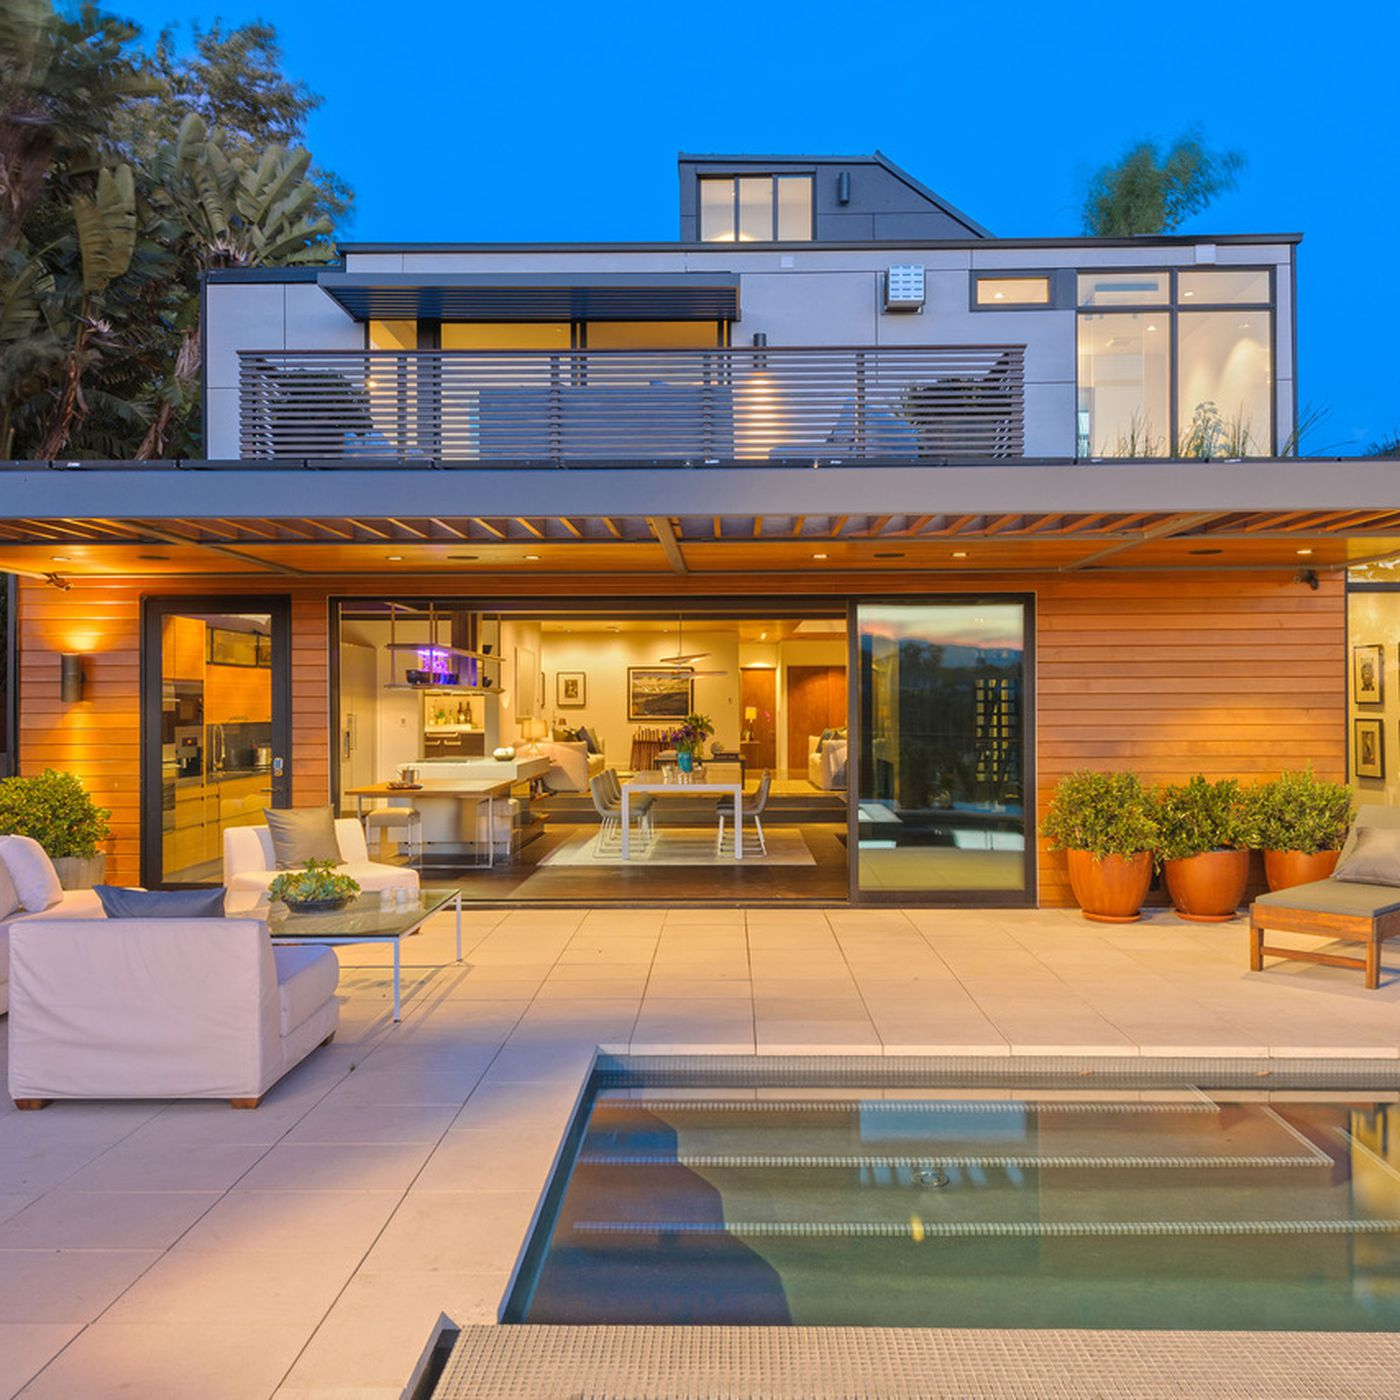 Amazon invests in prefab homebuilder Plant Prefab, potential